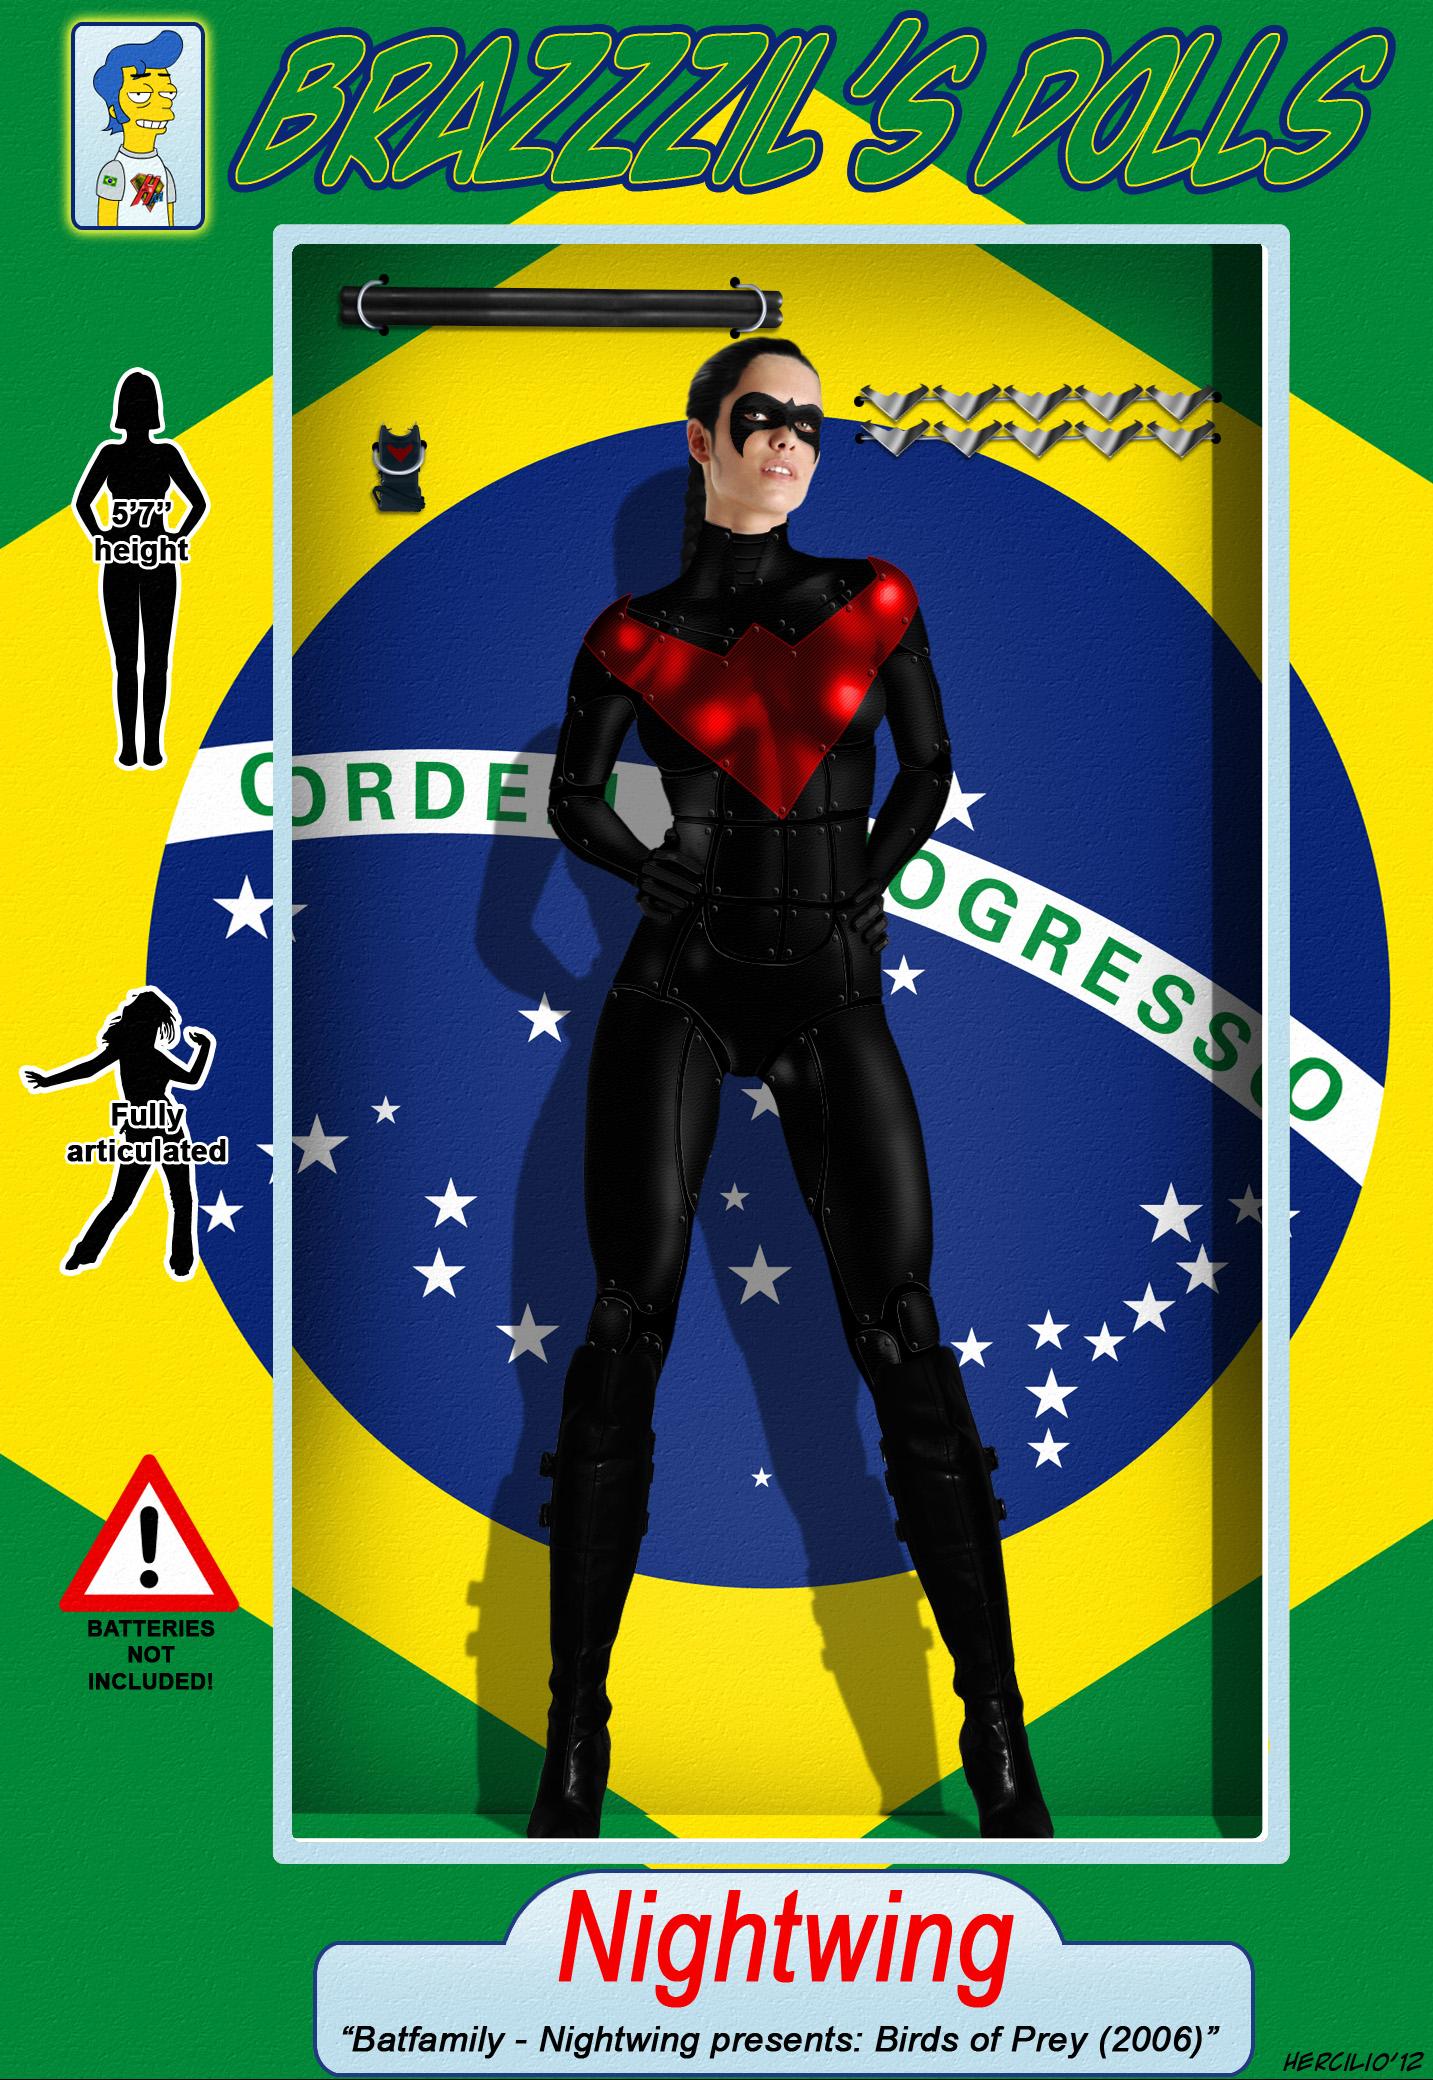 BRaZZZil's Dolls 3 - Nightwing